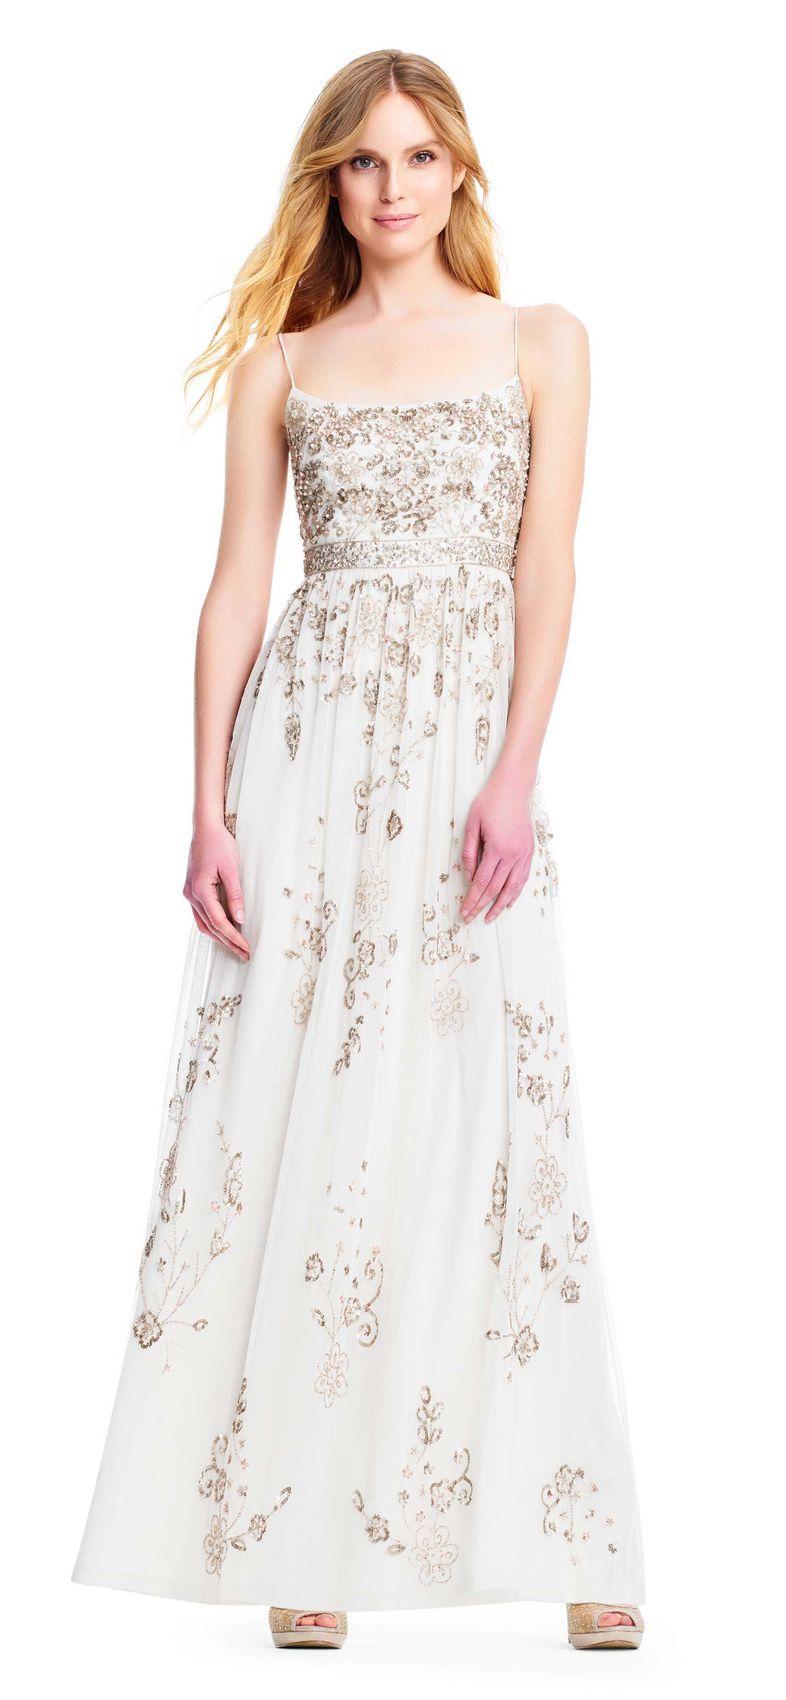 $500 wedding dress  Sequin Filigree Gown with Spaghetti Straps  Wedding dresses under